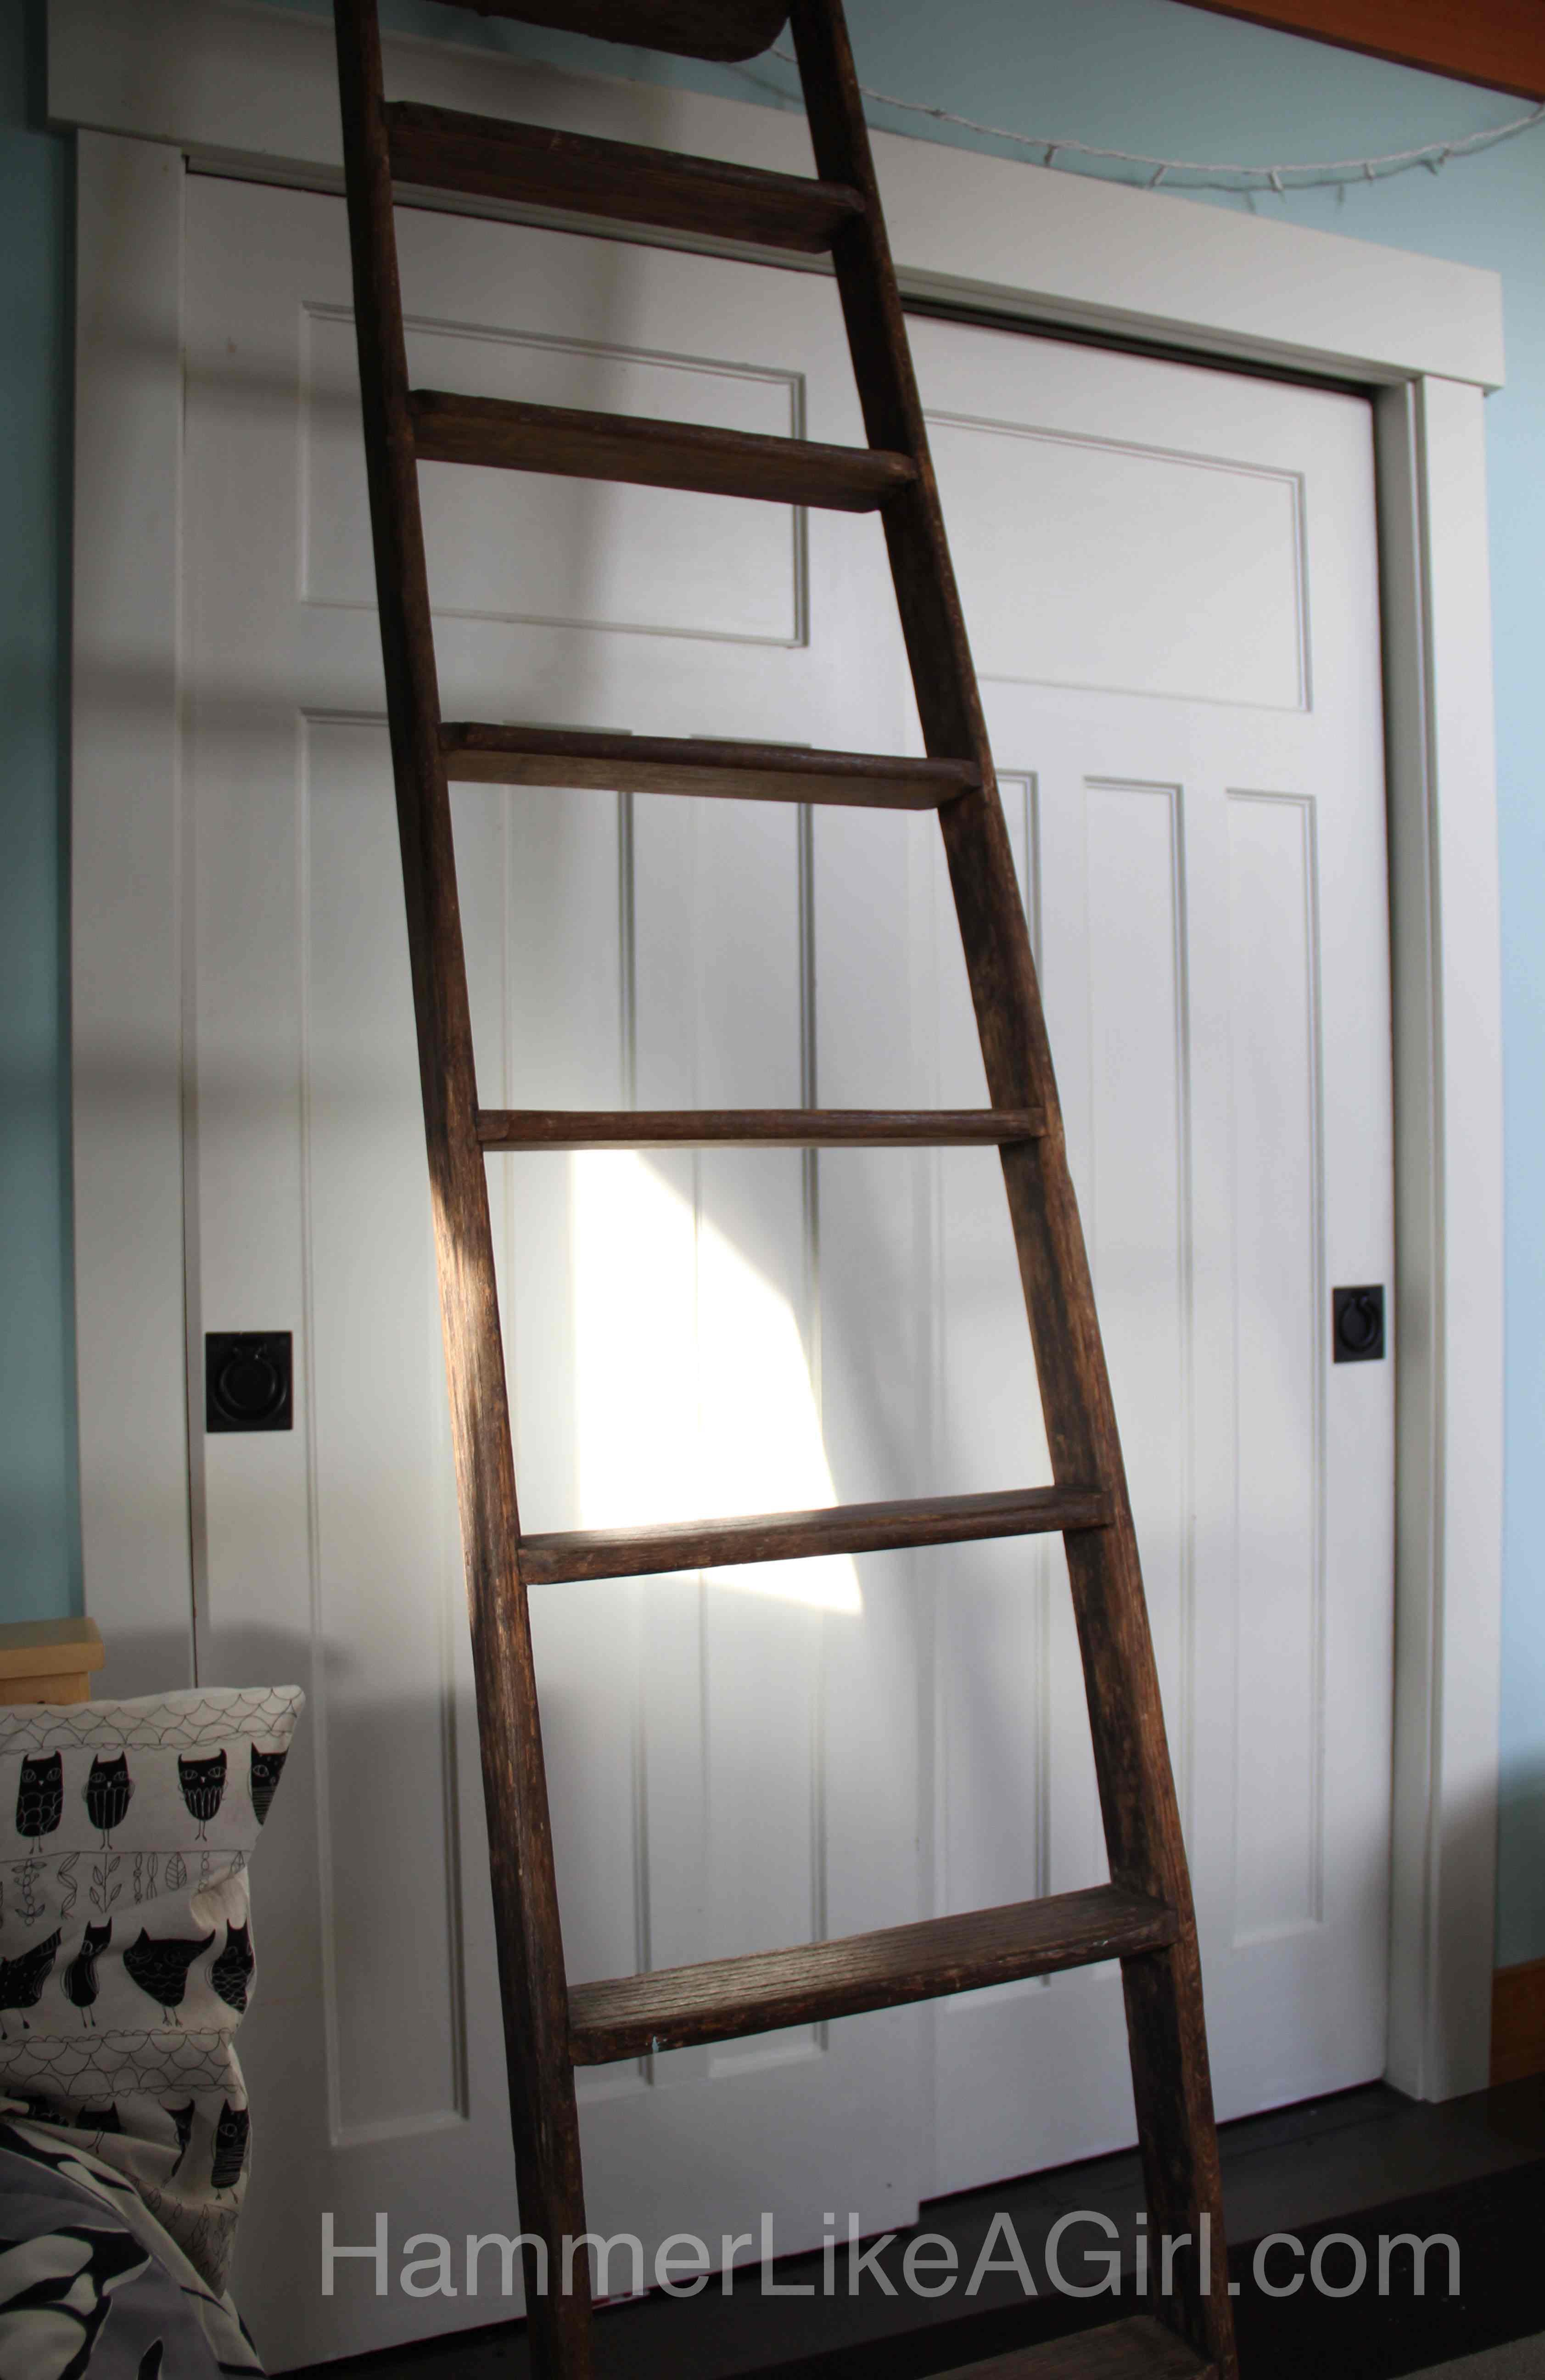 Salvaged Doors as Bypass Closet Doors & Using Salvaged Doors in a Remodel: Part 1 - Hammer Like a GirlHammer ...